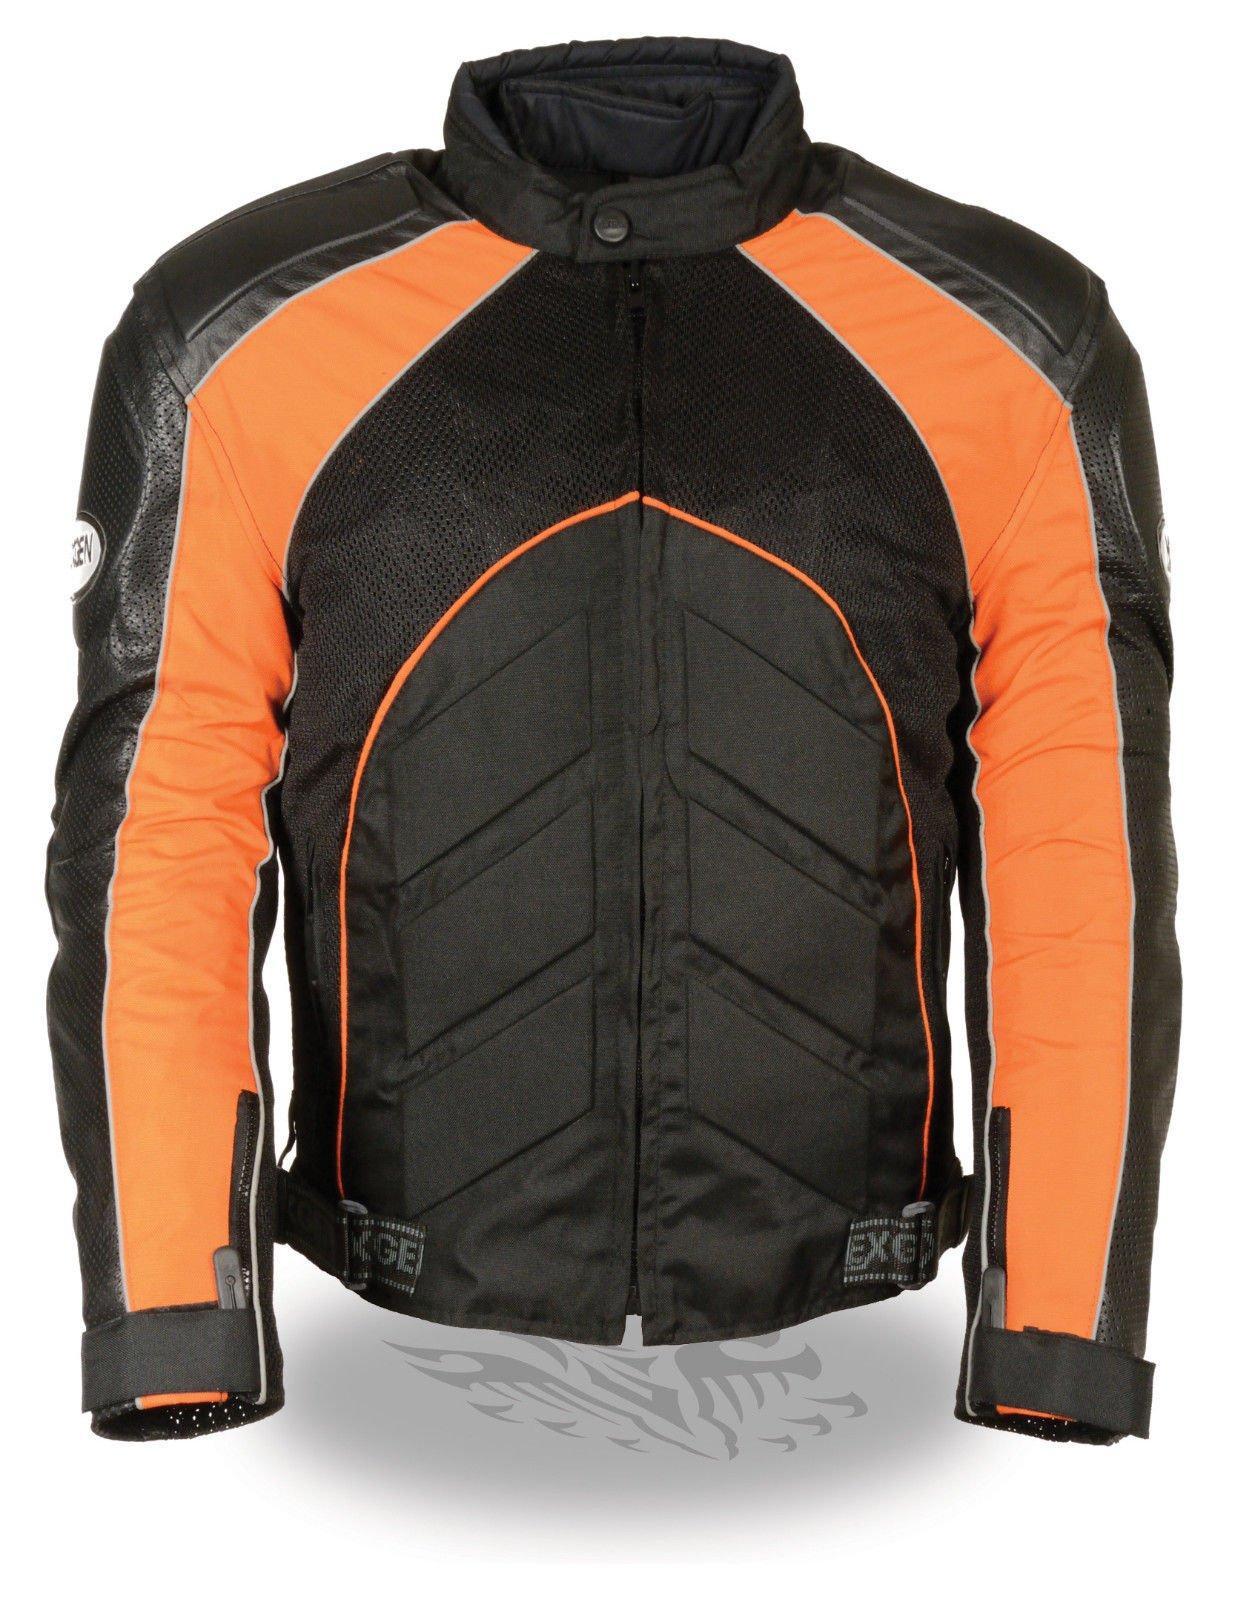 Men's Motorcycle BLK/Orange Mesh/Leather combo textile jacket with armors inside (3XL Regular)